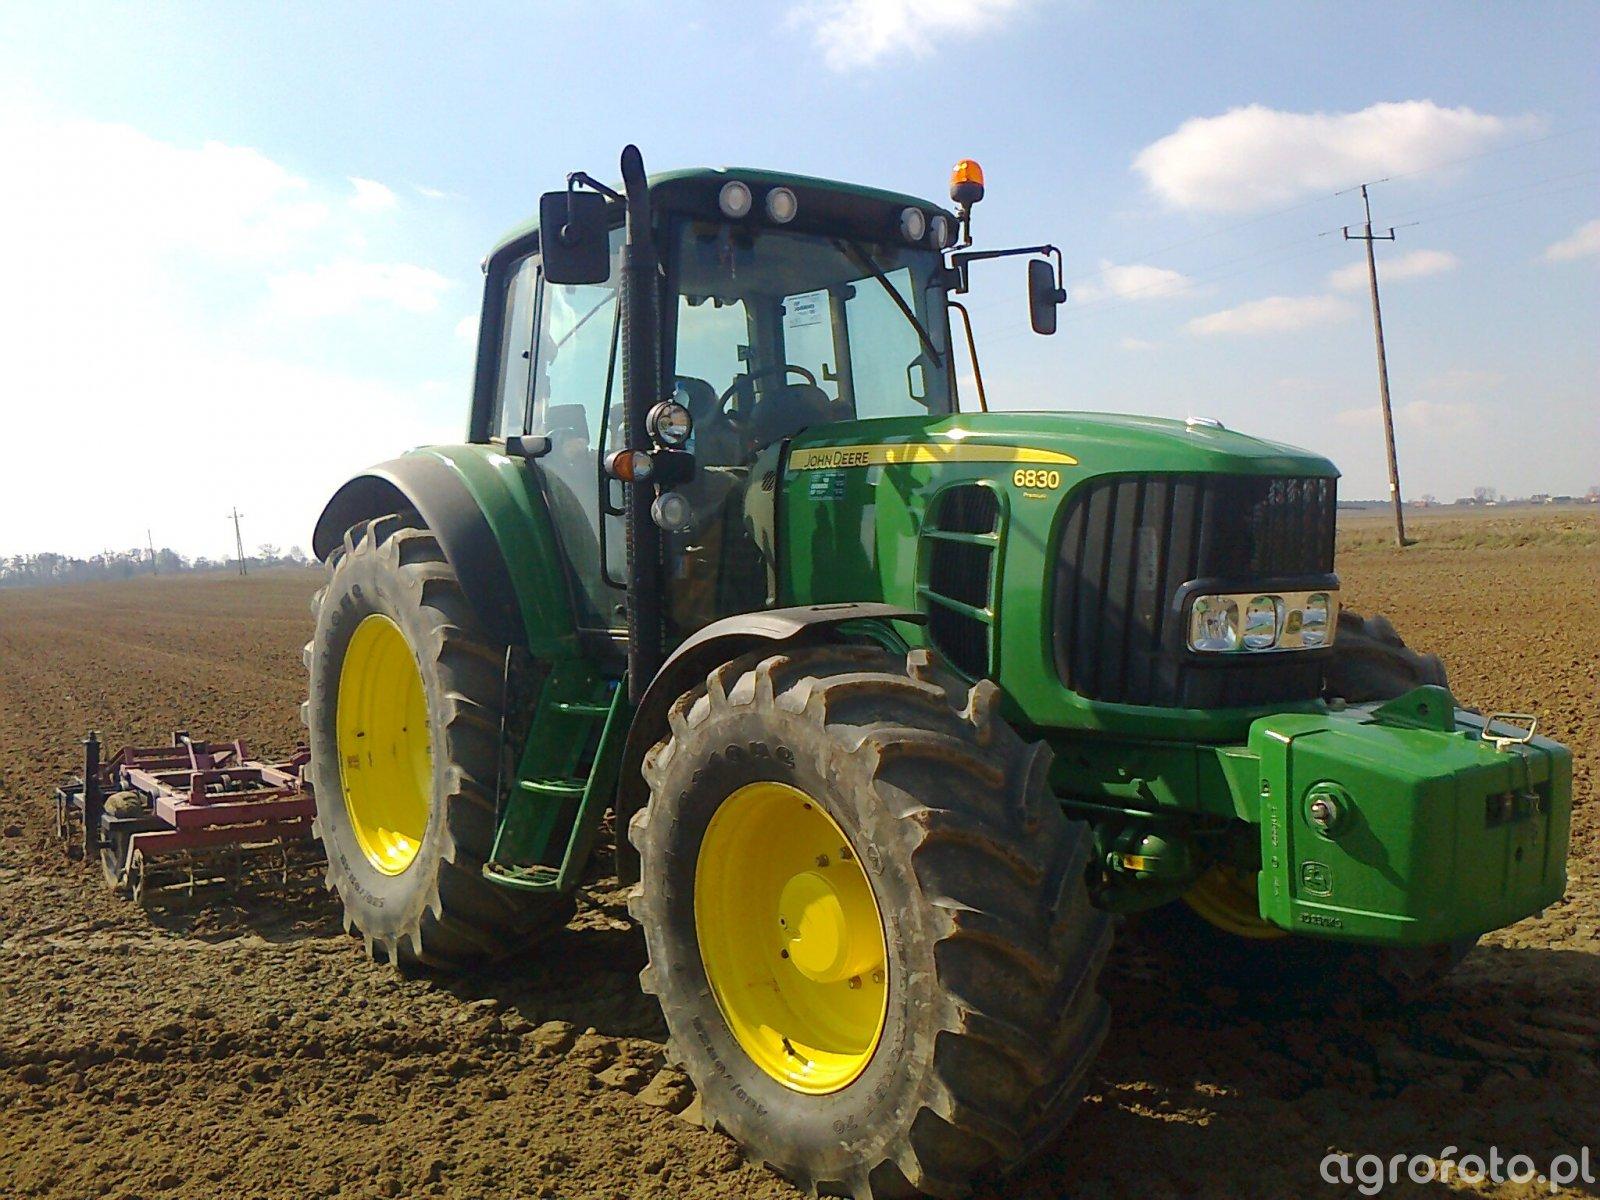 John Deere 6830 Premium + Agro Factory LECH